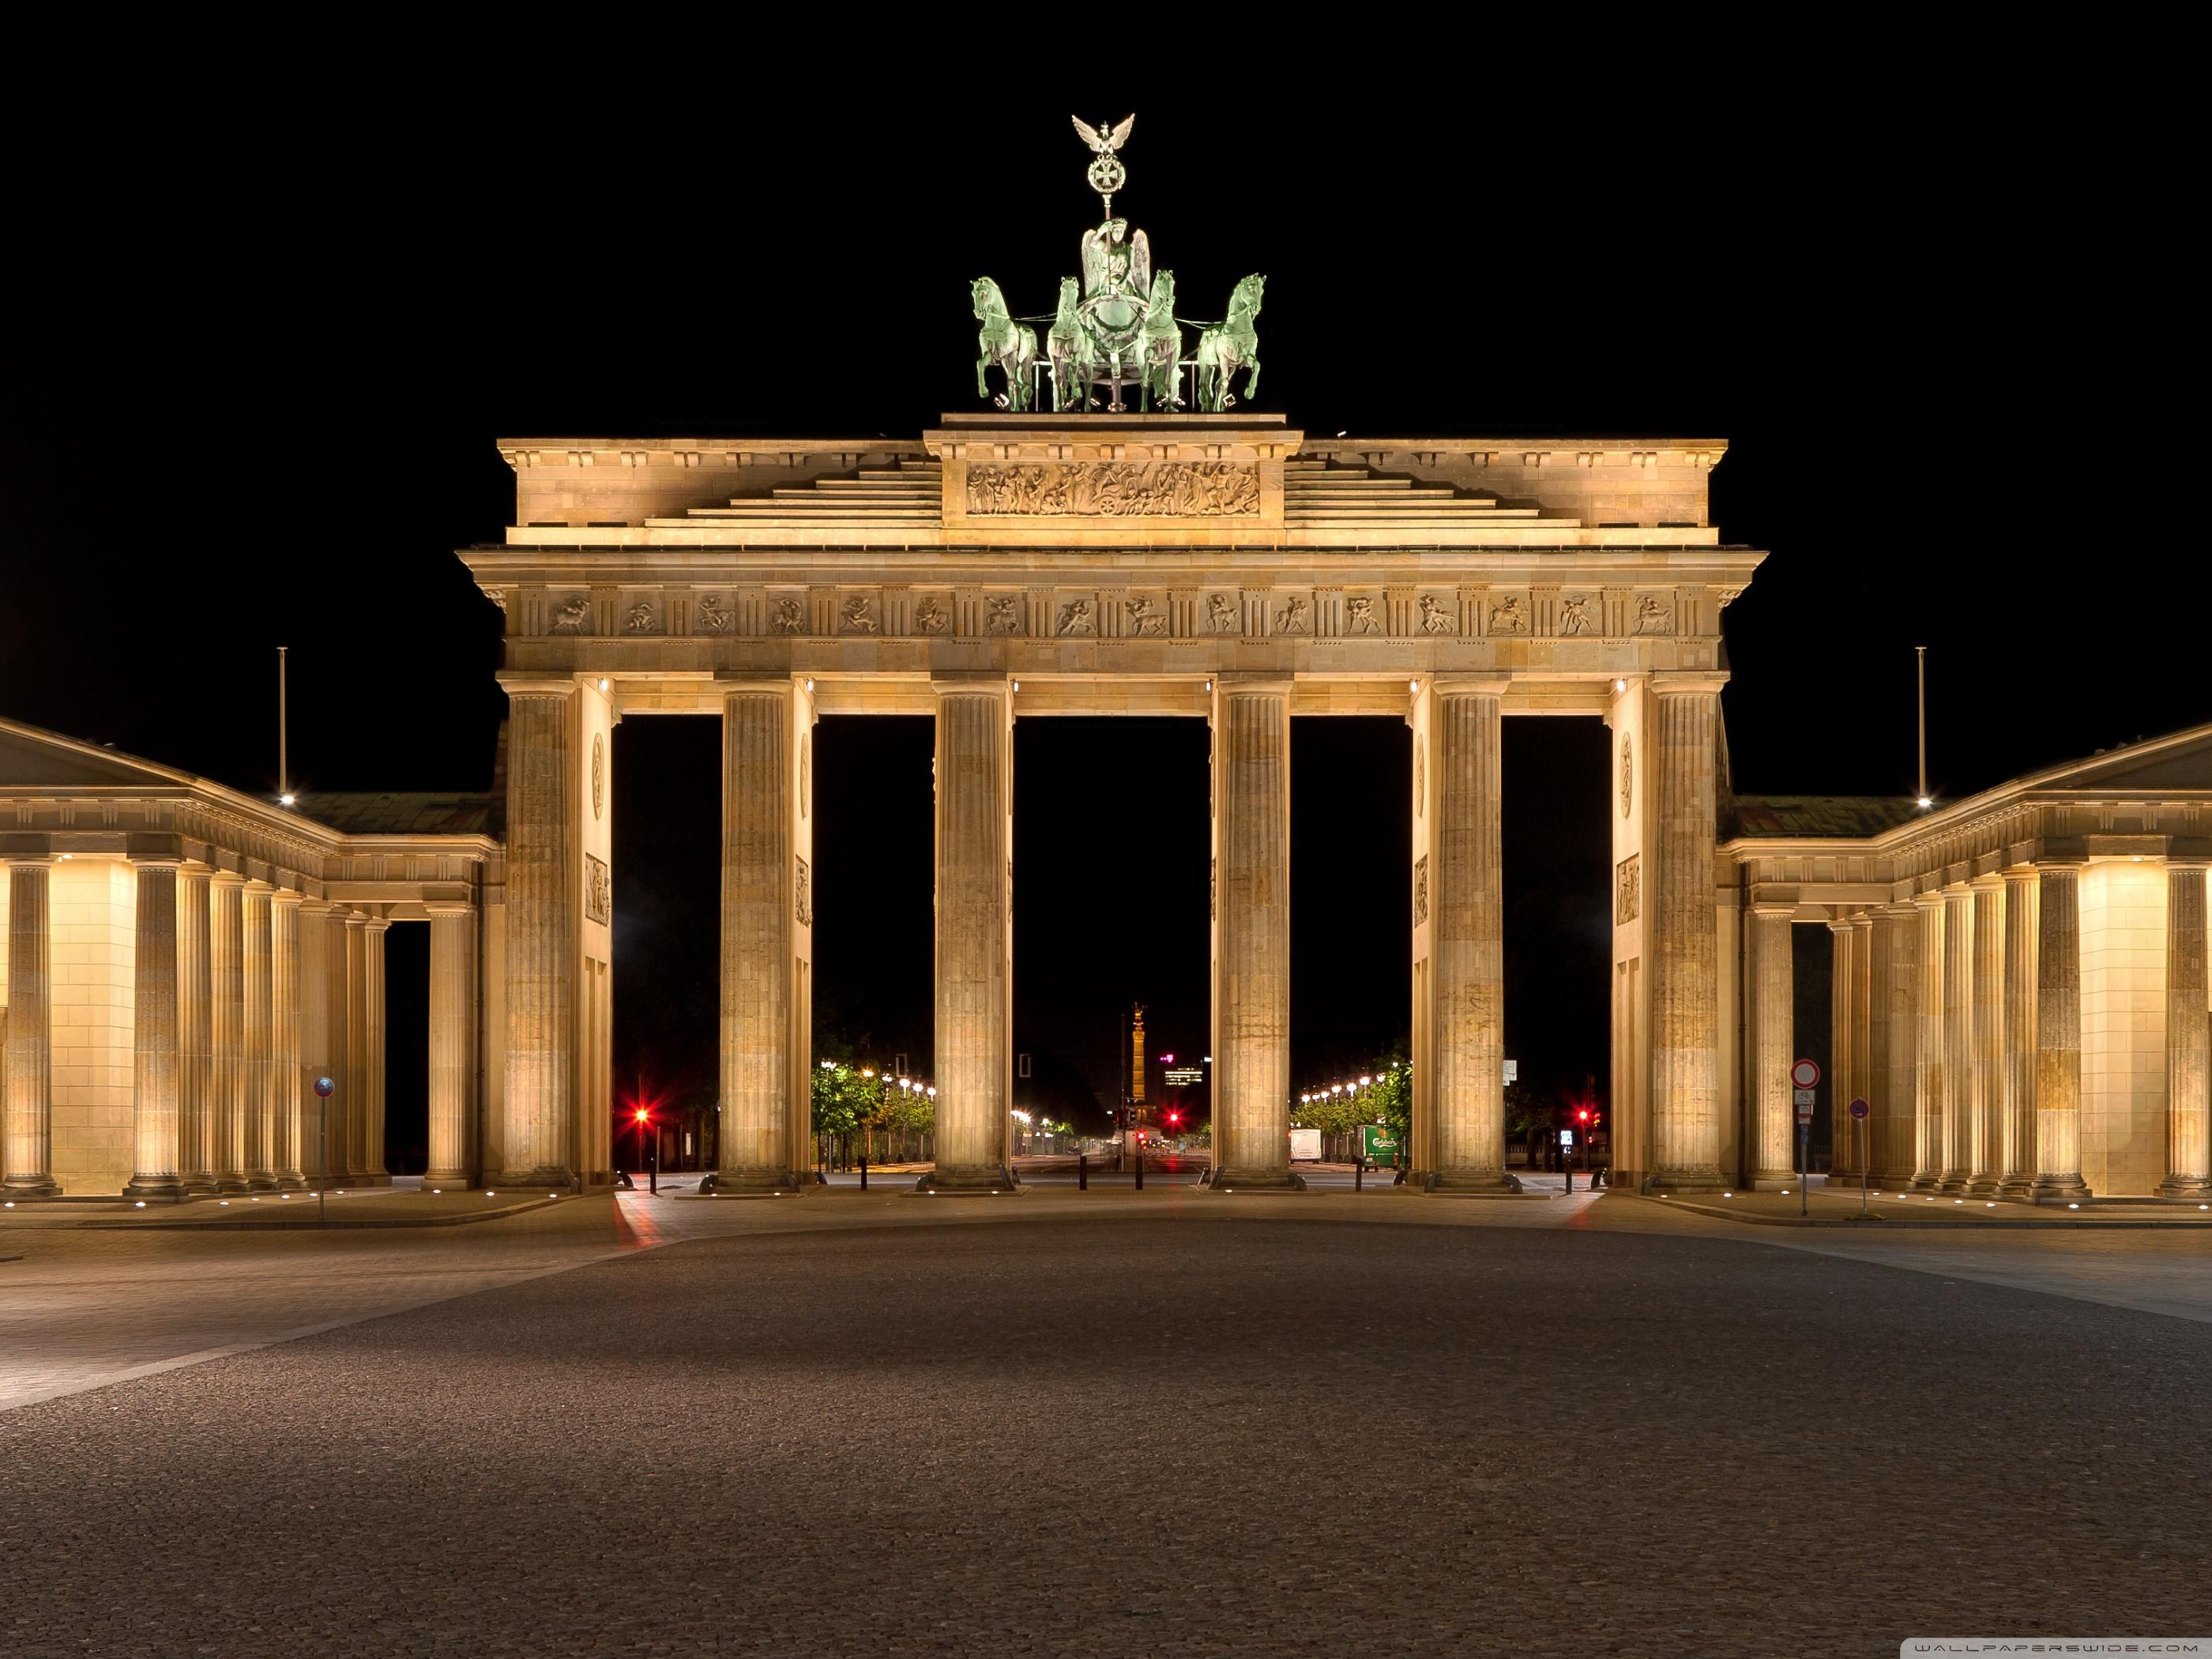 Brandenburg Gate 4K HD Desktop Wallpaper for 4K Ultra HD TV 2800x2100